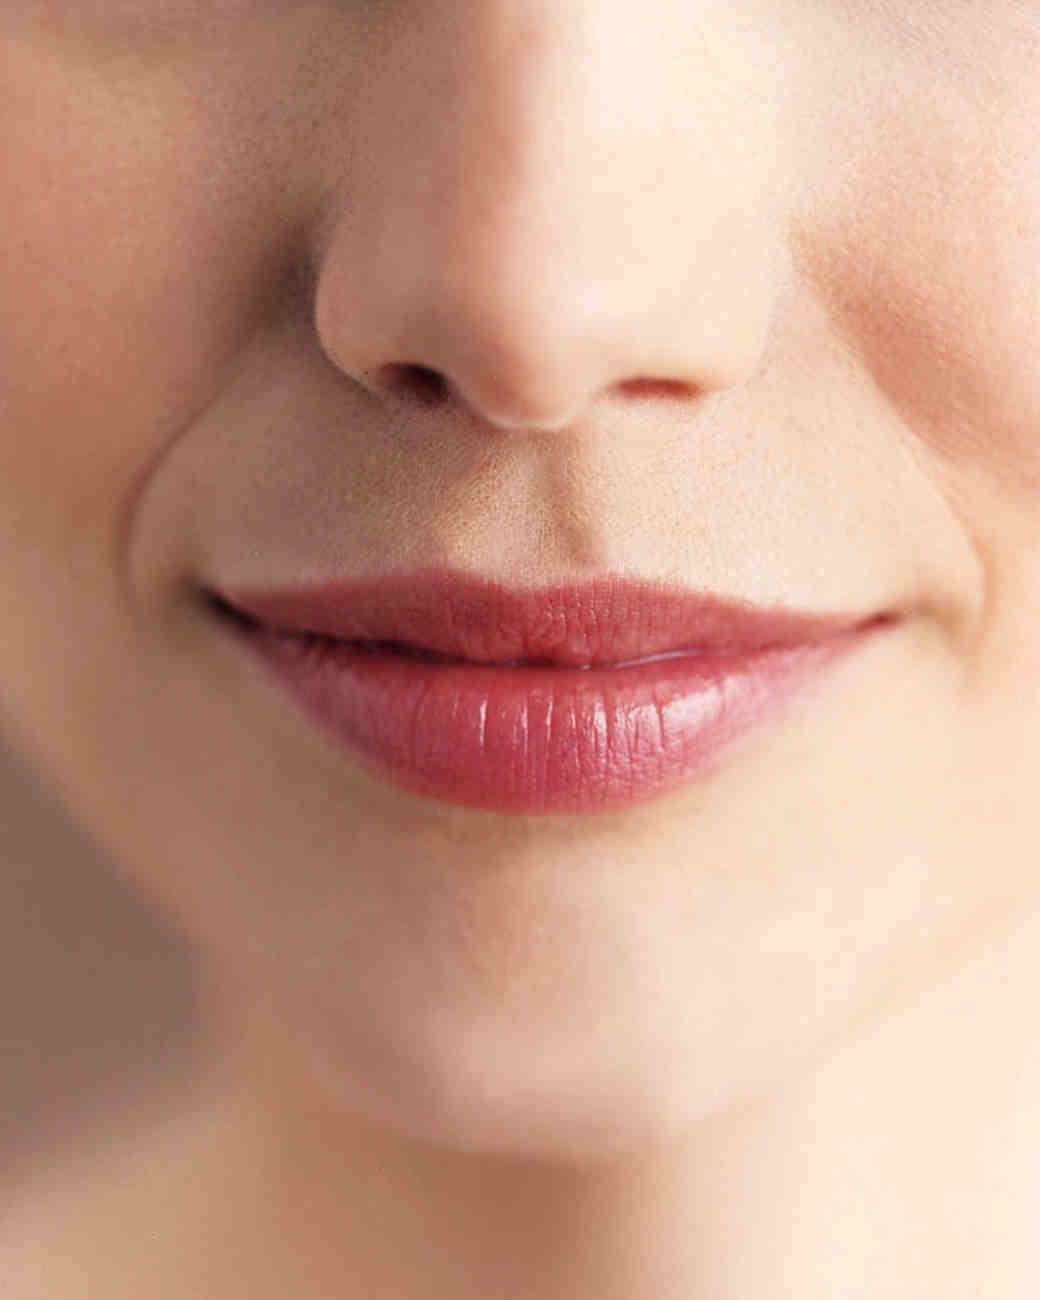 PunjabKesari, Natural lips Image, Girls Nature Image